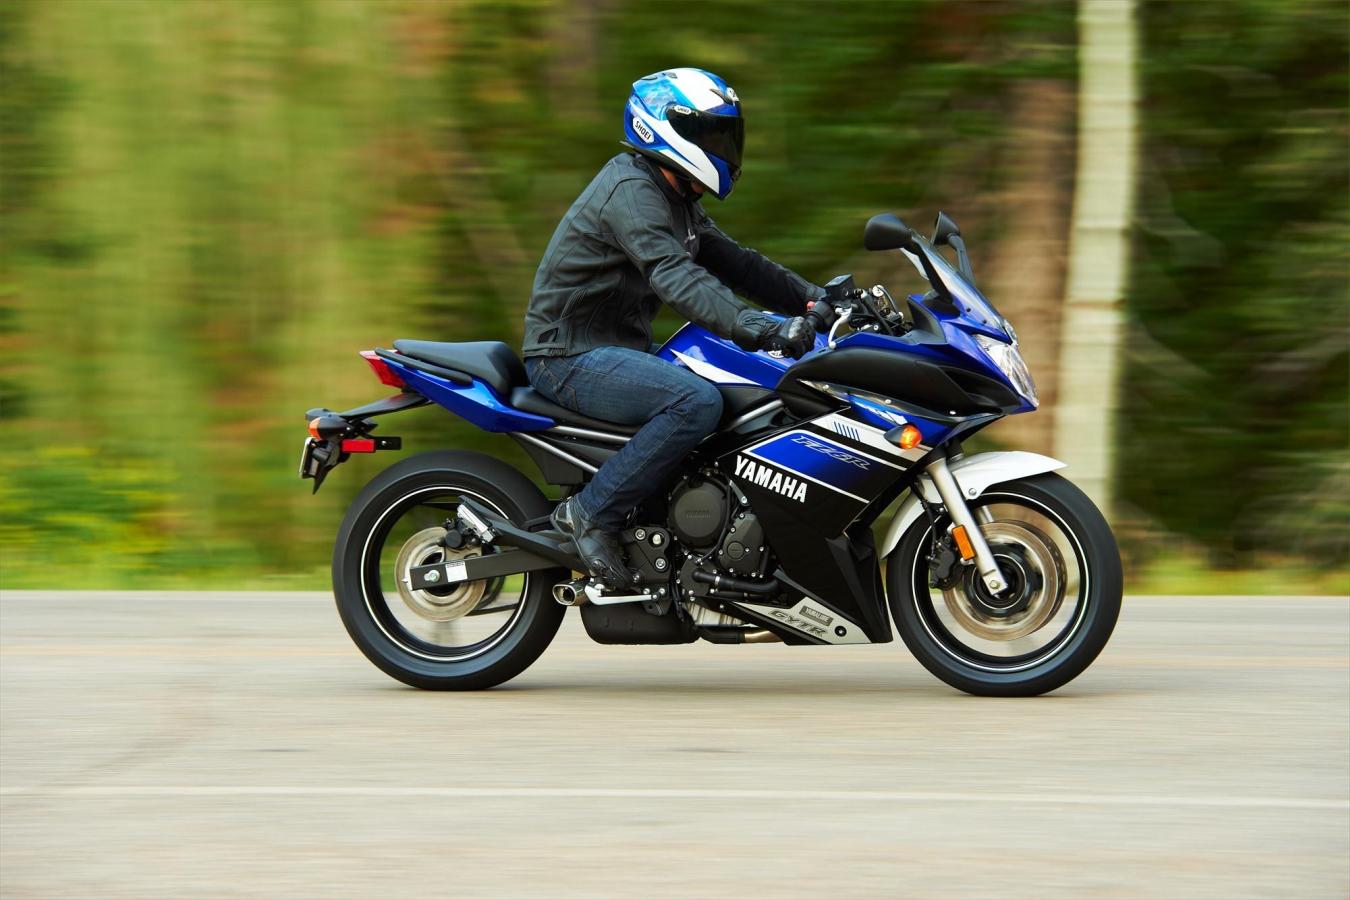 370z Nismo Specs >> 2013 Yamaha FZ6R - autoevolution